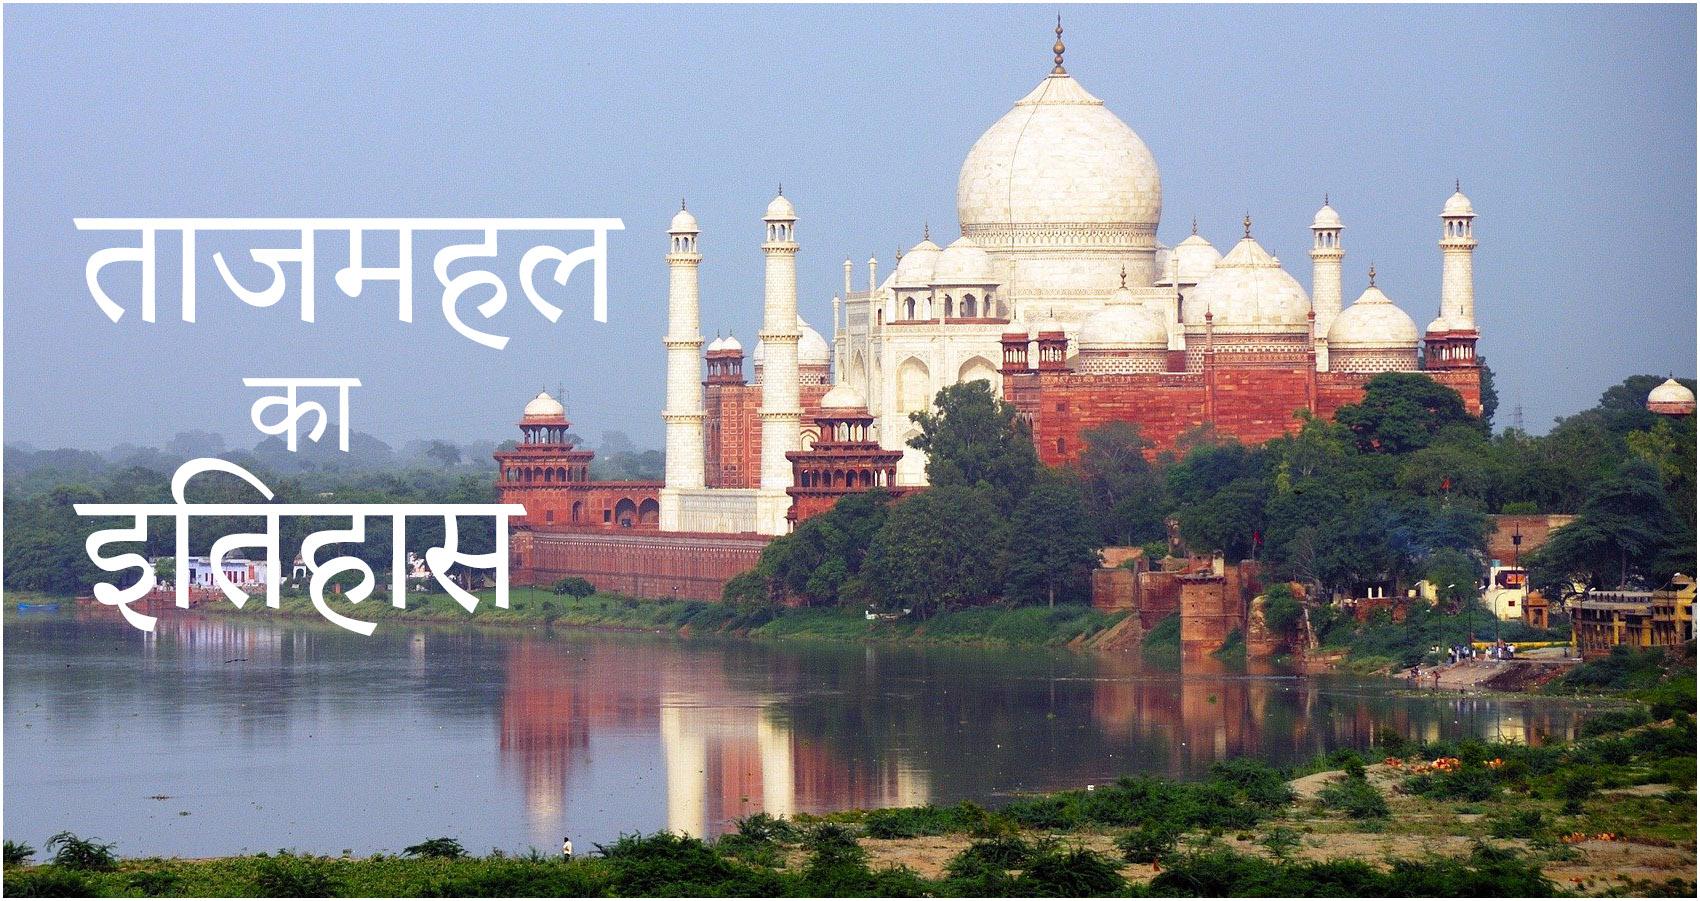 Taj Mahal History in Hindi [ताजमहल का इतिहास]